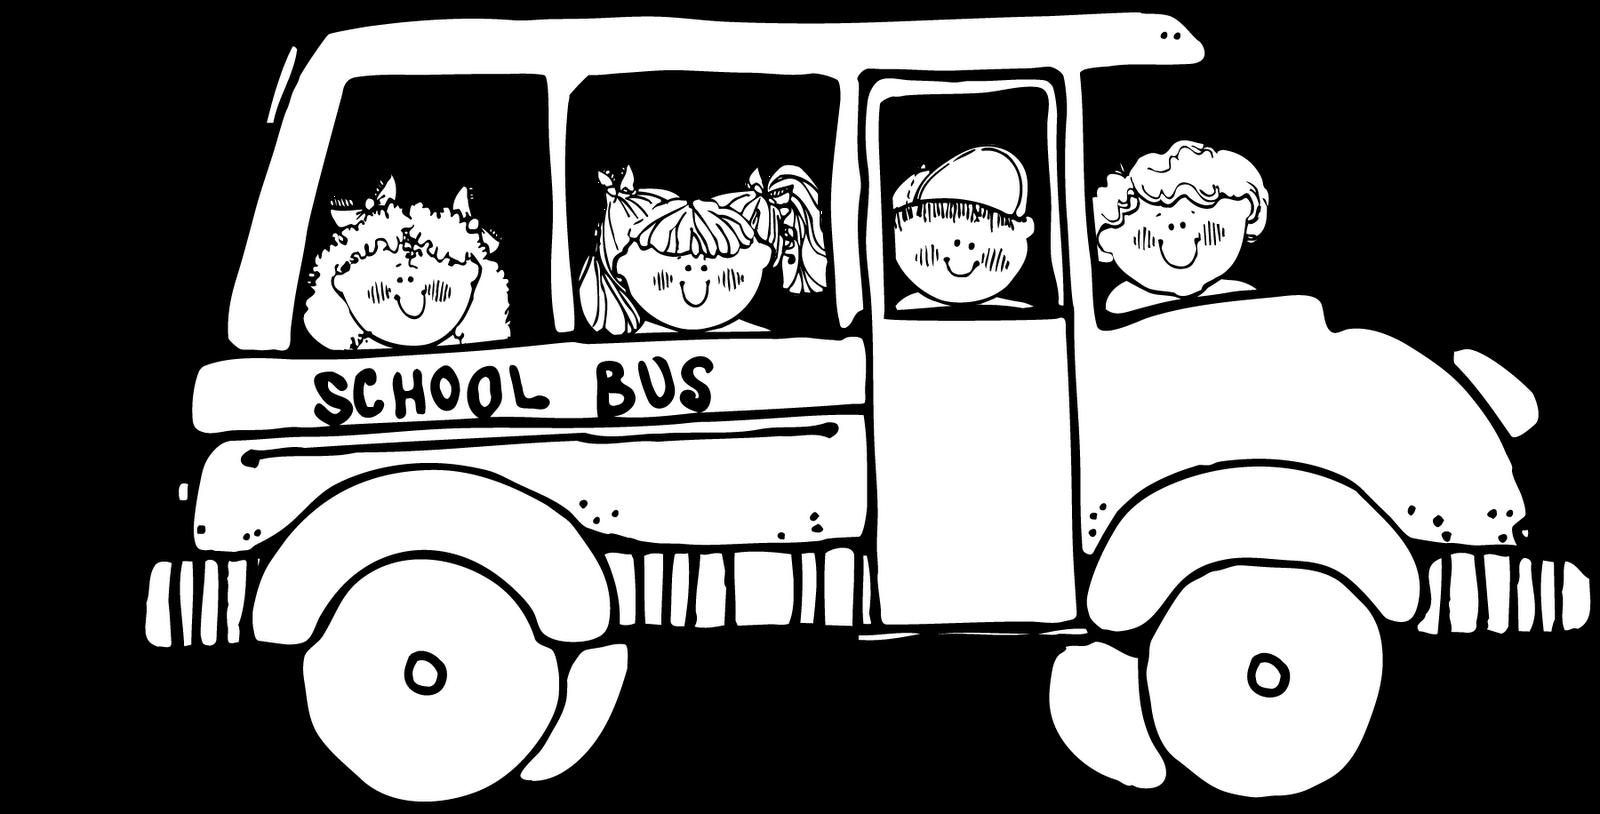 school bus image black and white mrs ayala s kinder fun national rh pinterest co uk